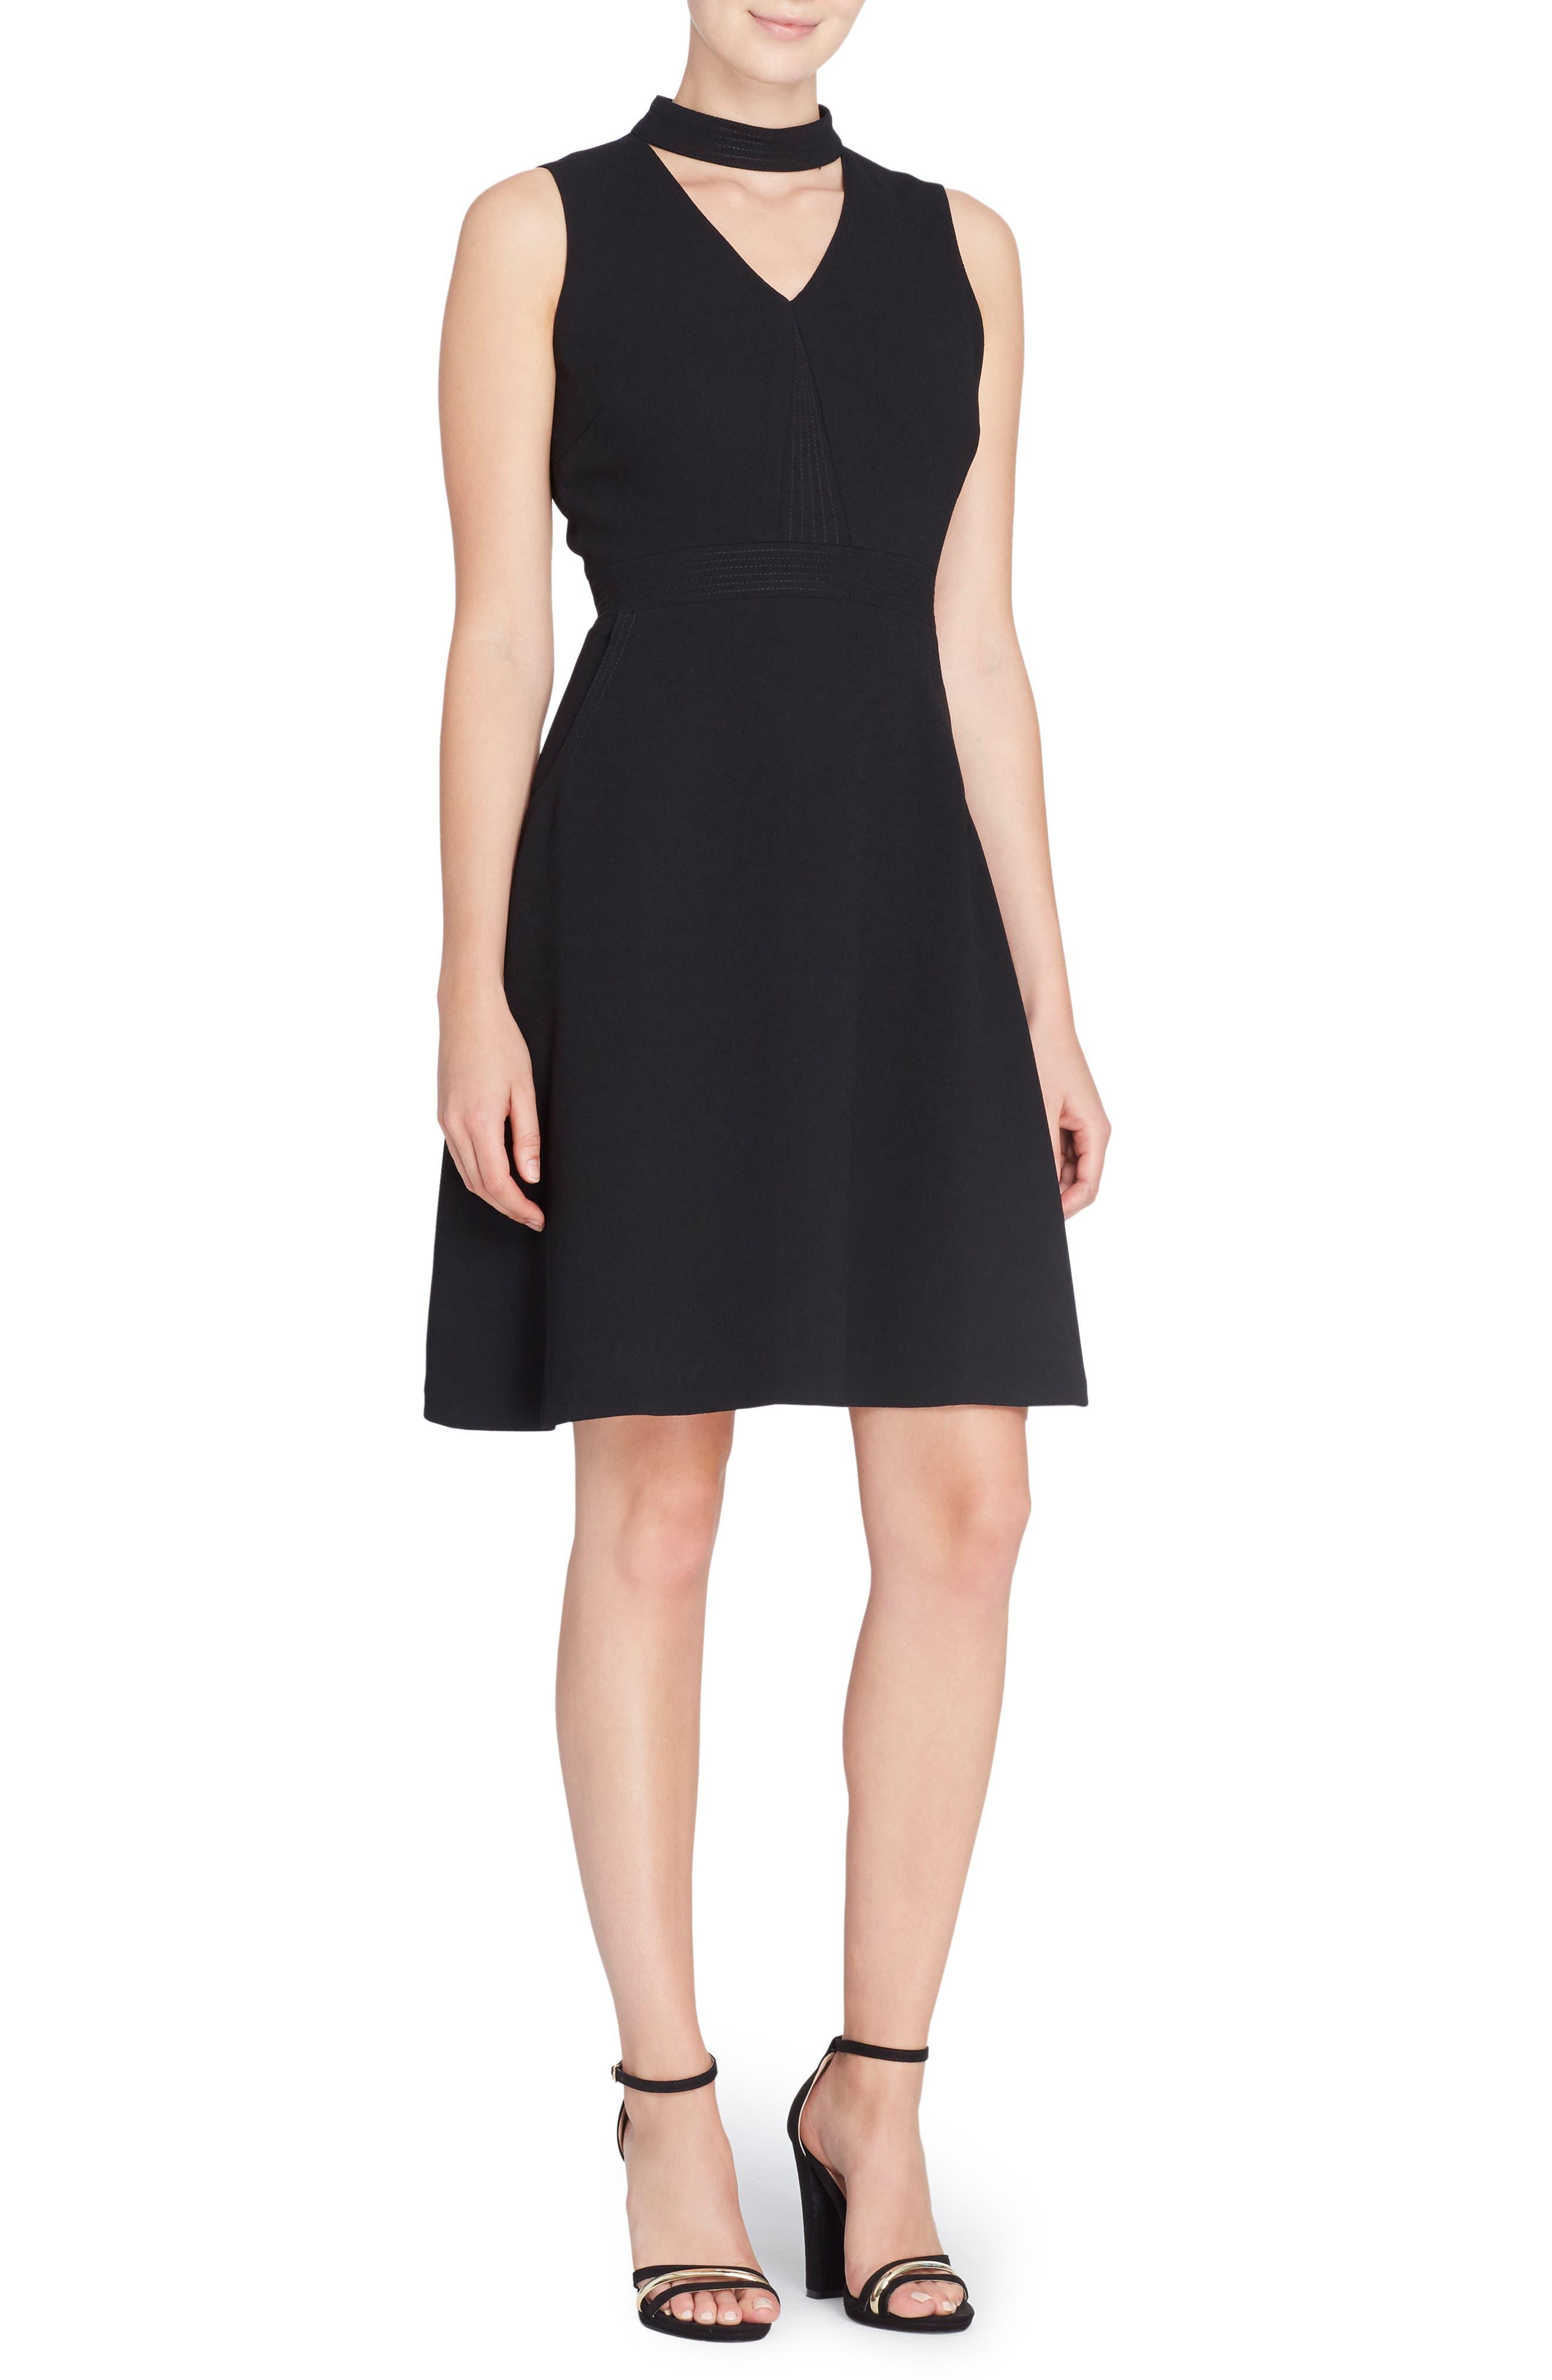 Alternate Image 1 Selected - Catherine Catherine Malandrino Wendy Choker Fit & Flare Dress